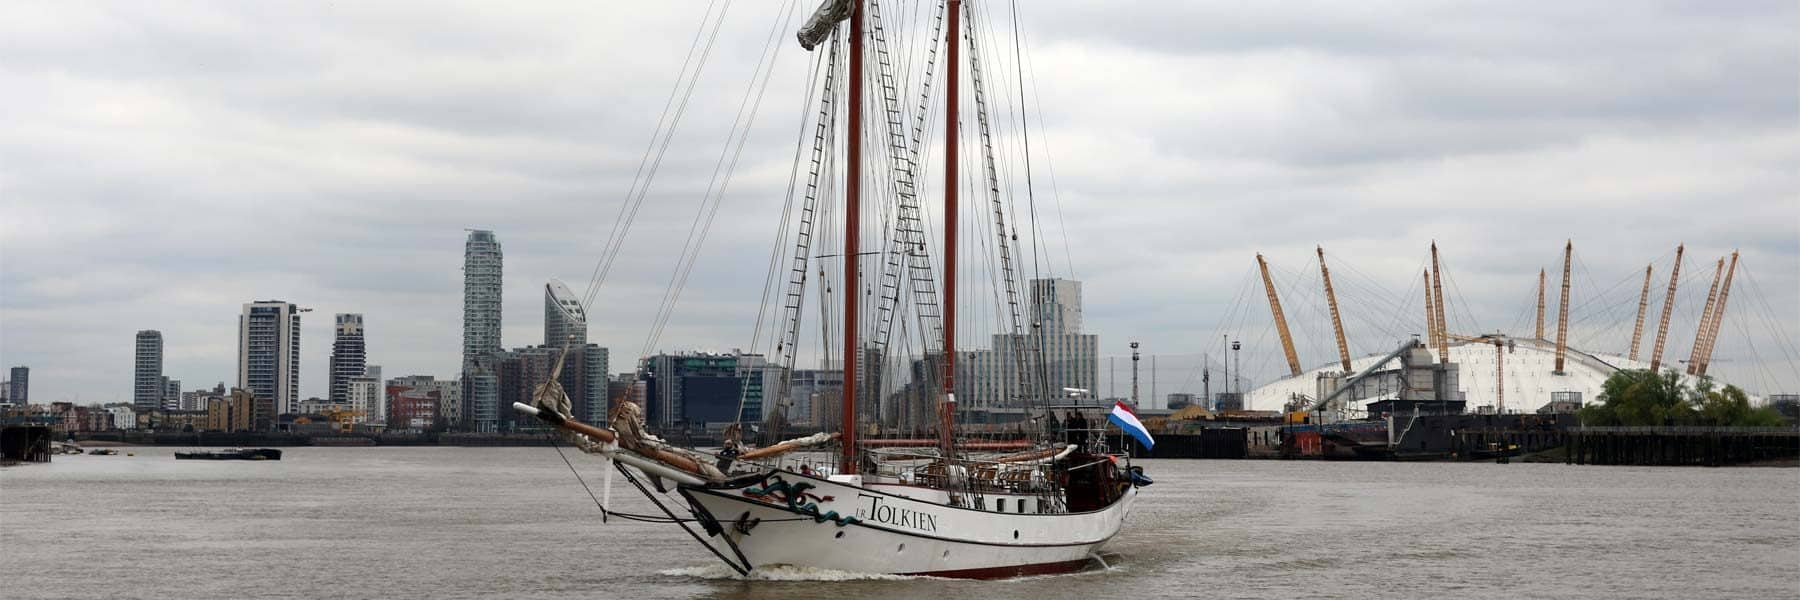 Tall Ship J. R. Tolkien approaching the Royal Borough of Greenwich